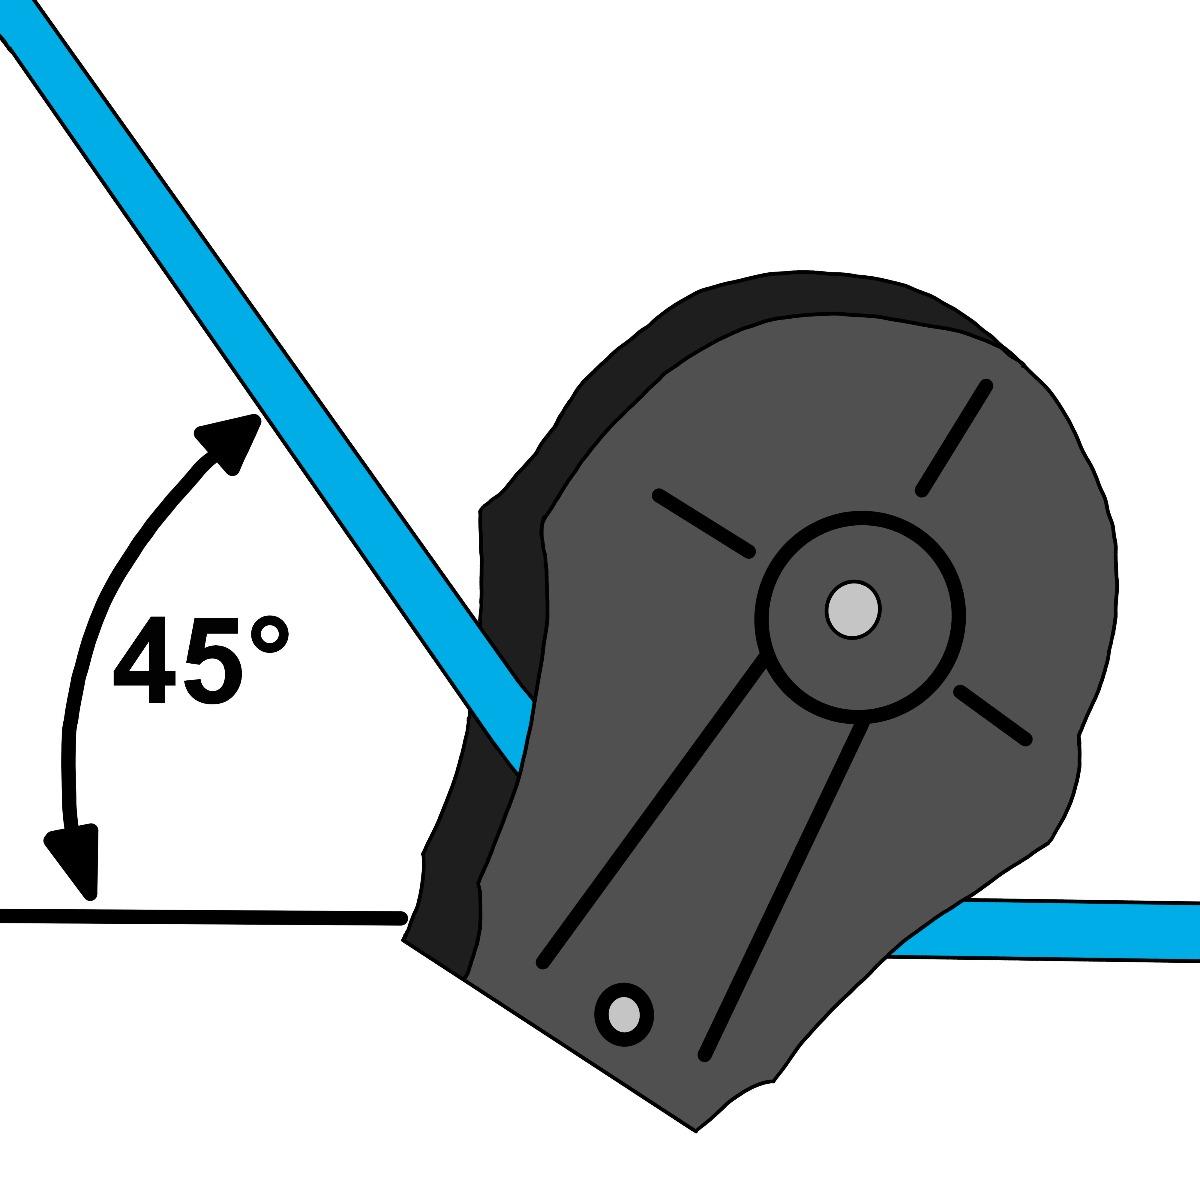 Sailing hardware advice: breaking load of blocks